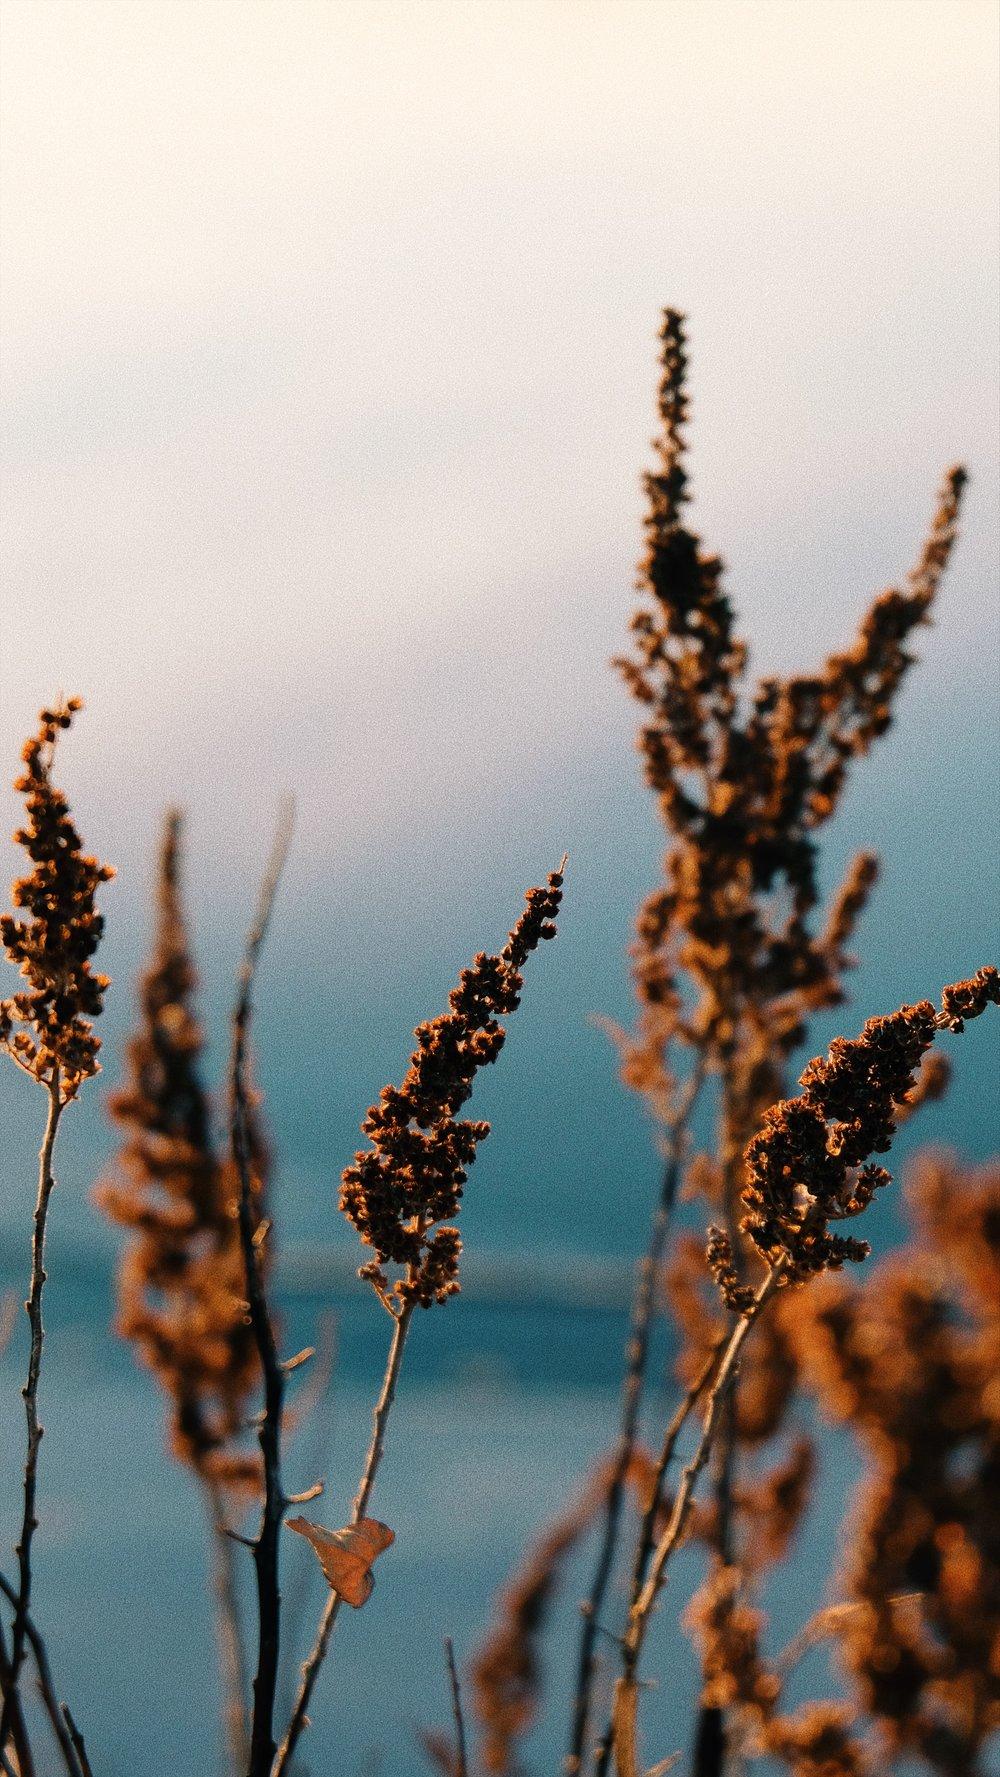 golden-hour-at-lake-grass